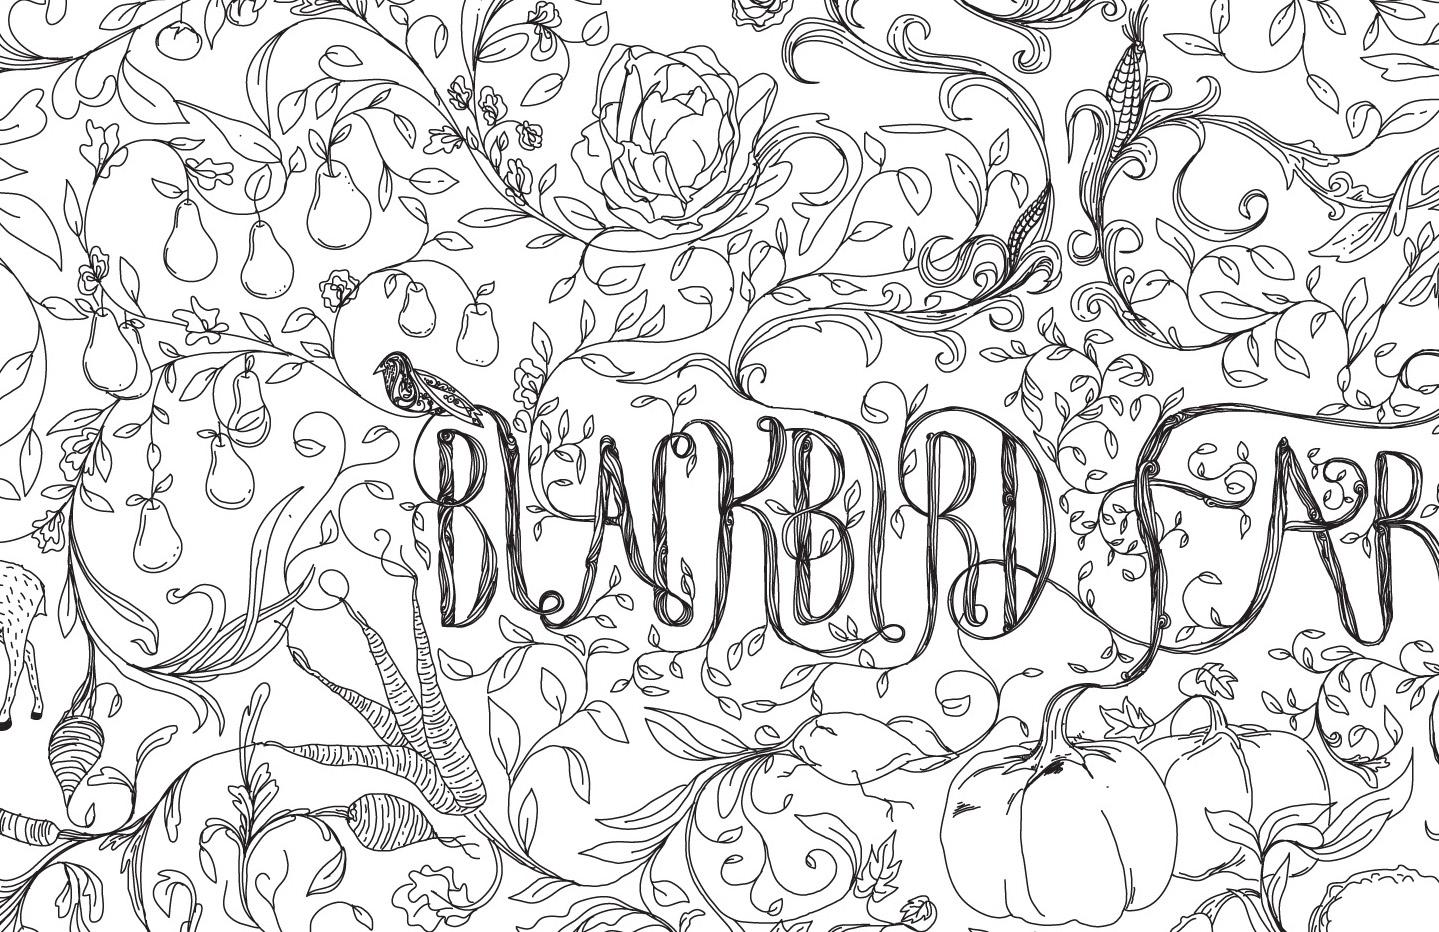 Blackbird_Farm_Art_detail.jpg